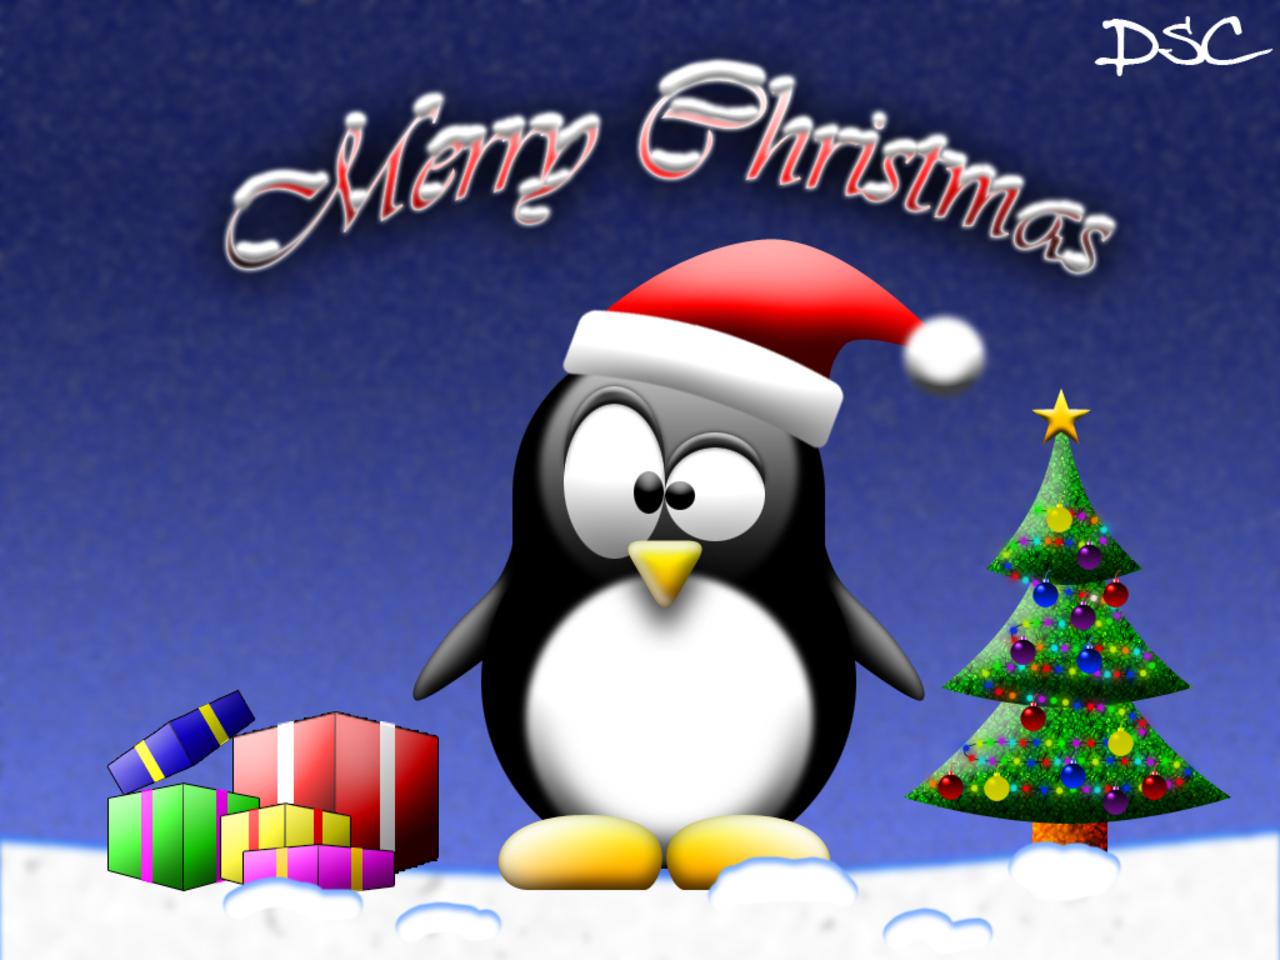 Feliz navidad en ingles